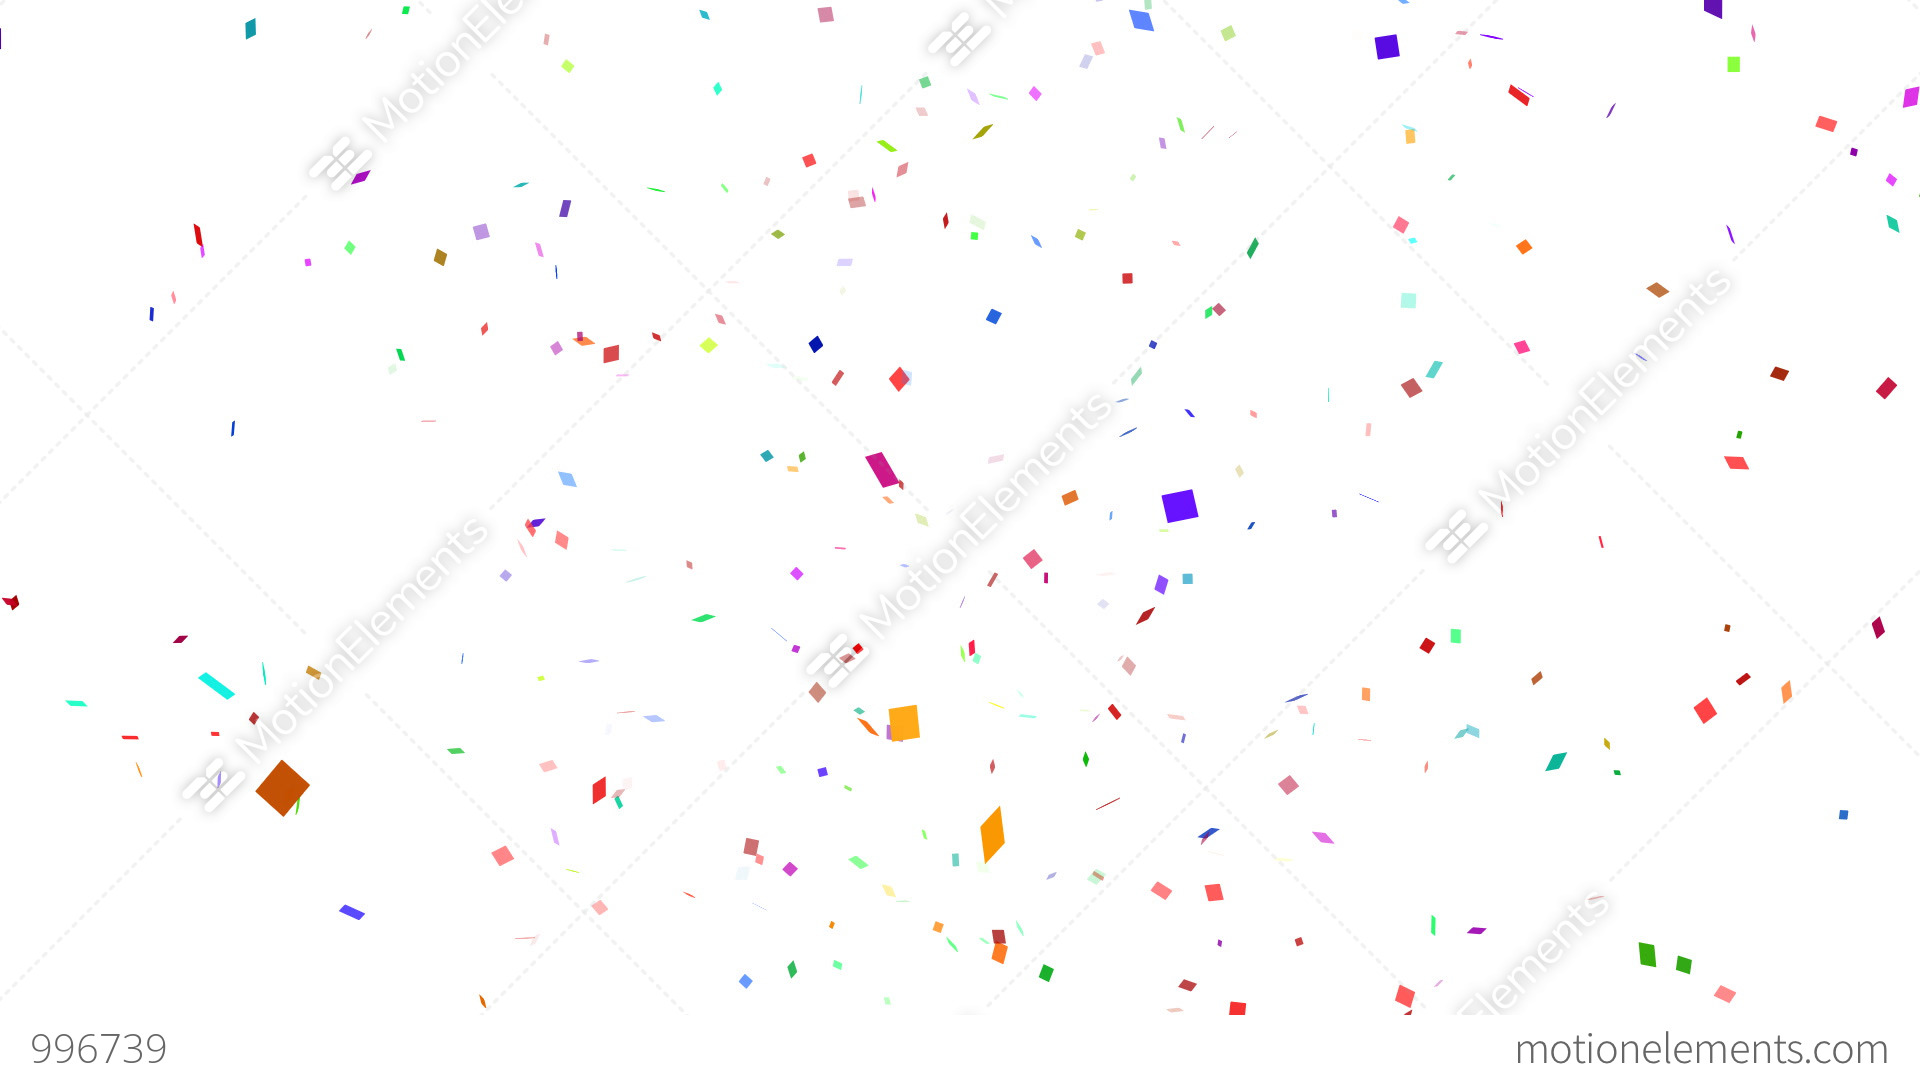 Falling Money Wallpaper Hd Falling Confetti Animation Stock Animation 996739